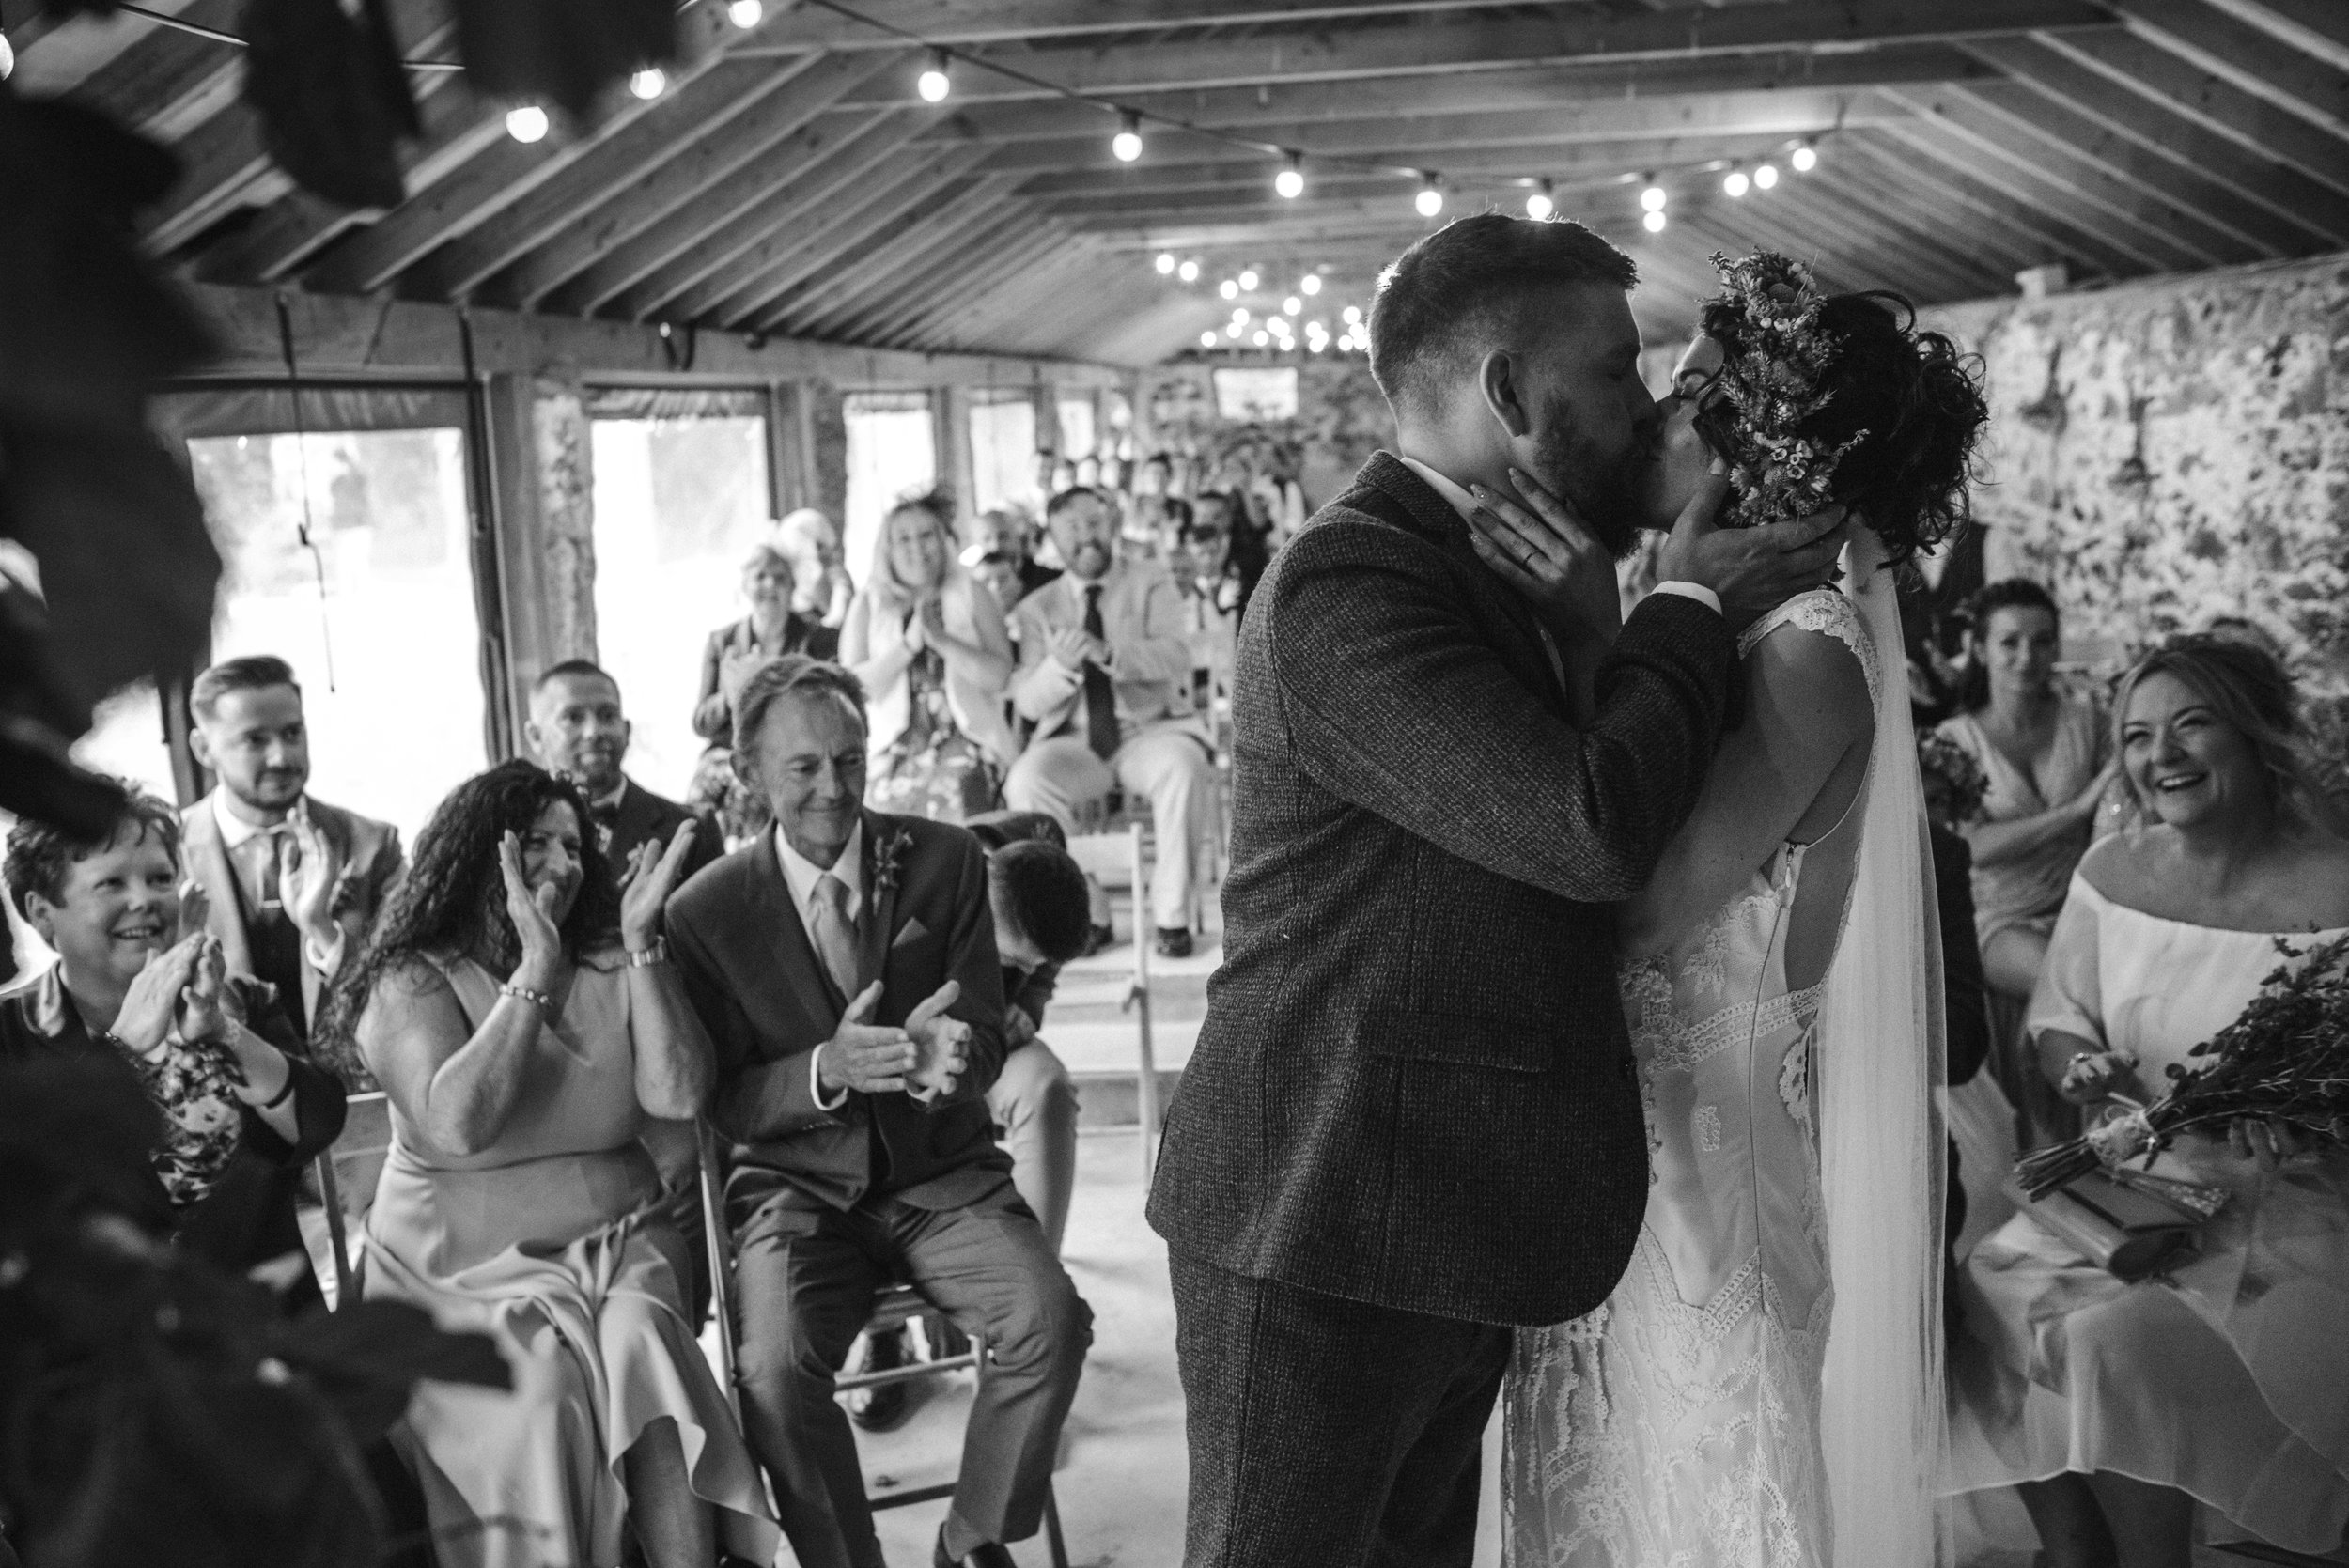 pengenna-manor-wedding-photographer-31.jpg